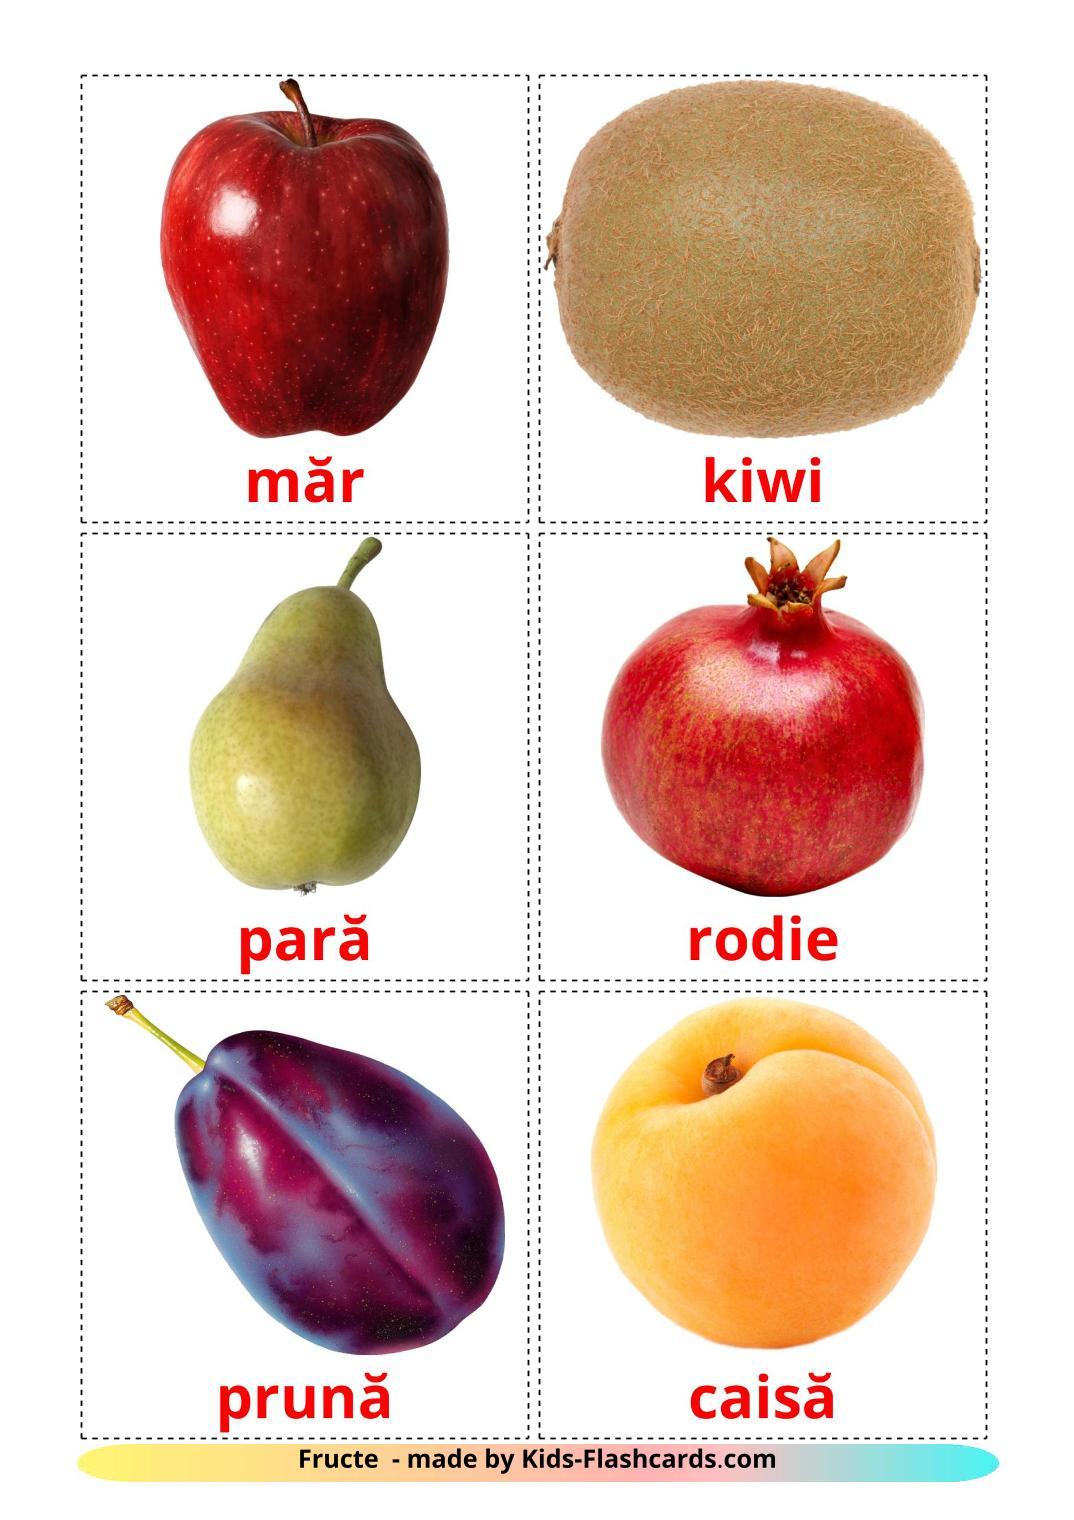 Fruits - 20 Free Printable romanian Flashcards